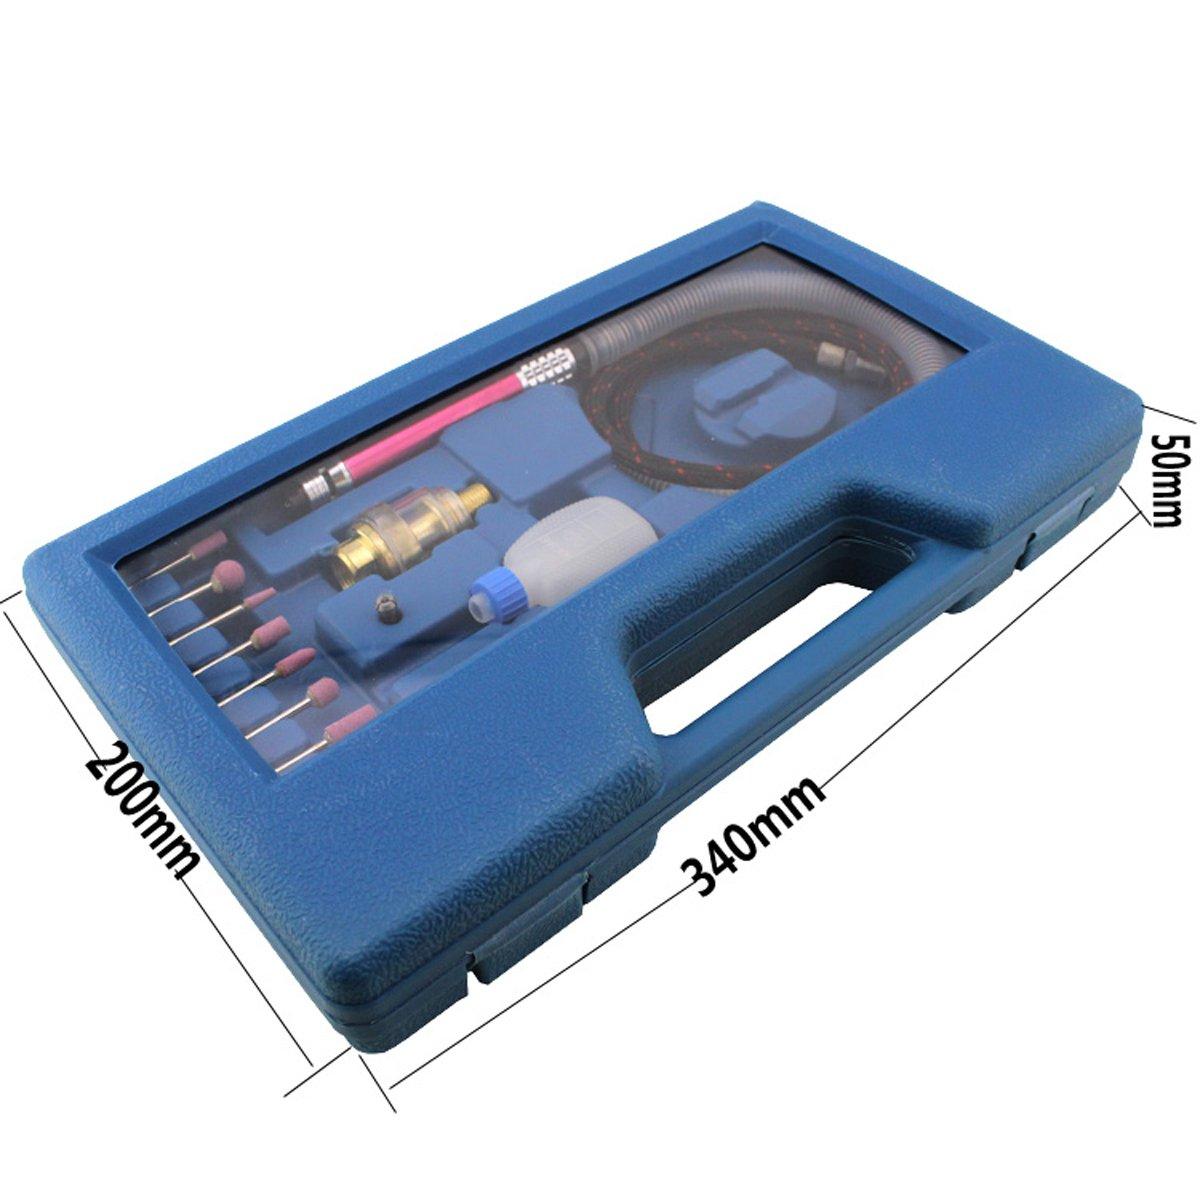 1//8 Pneumatic Micro Air Pencil Die Grinder Polishing Engraver Tool Kit szdealhola